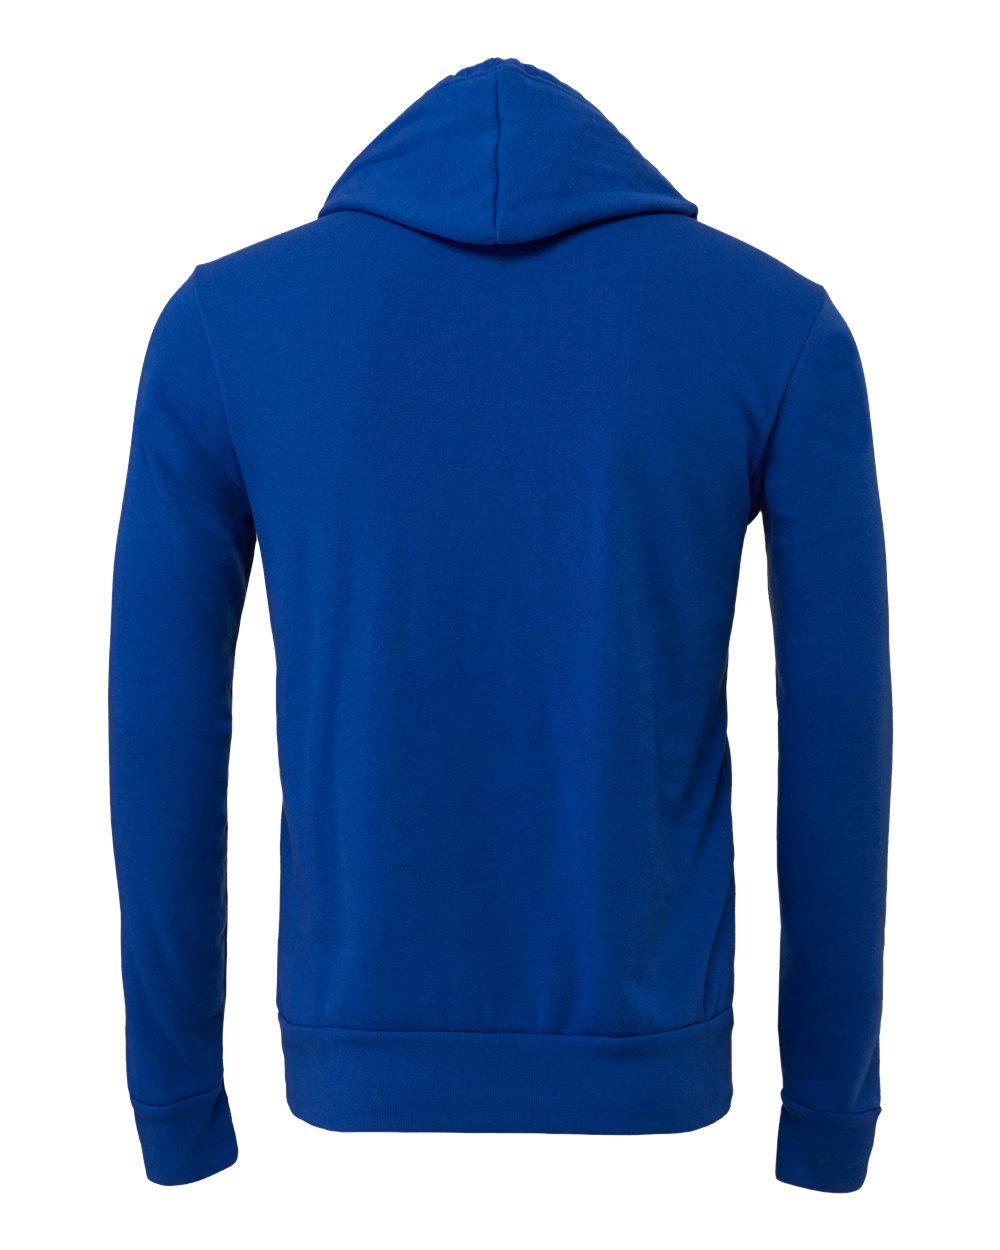 Bella-Canvas-Unisex-Sponge-Hooded-Pullover-Sweatshirt-Blank-3719-up-to-2XL thumbnail 99